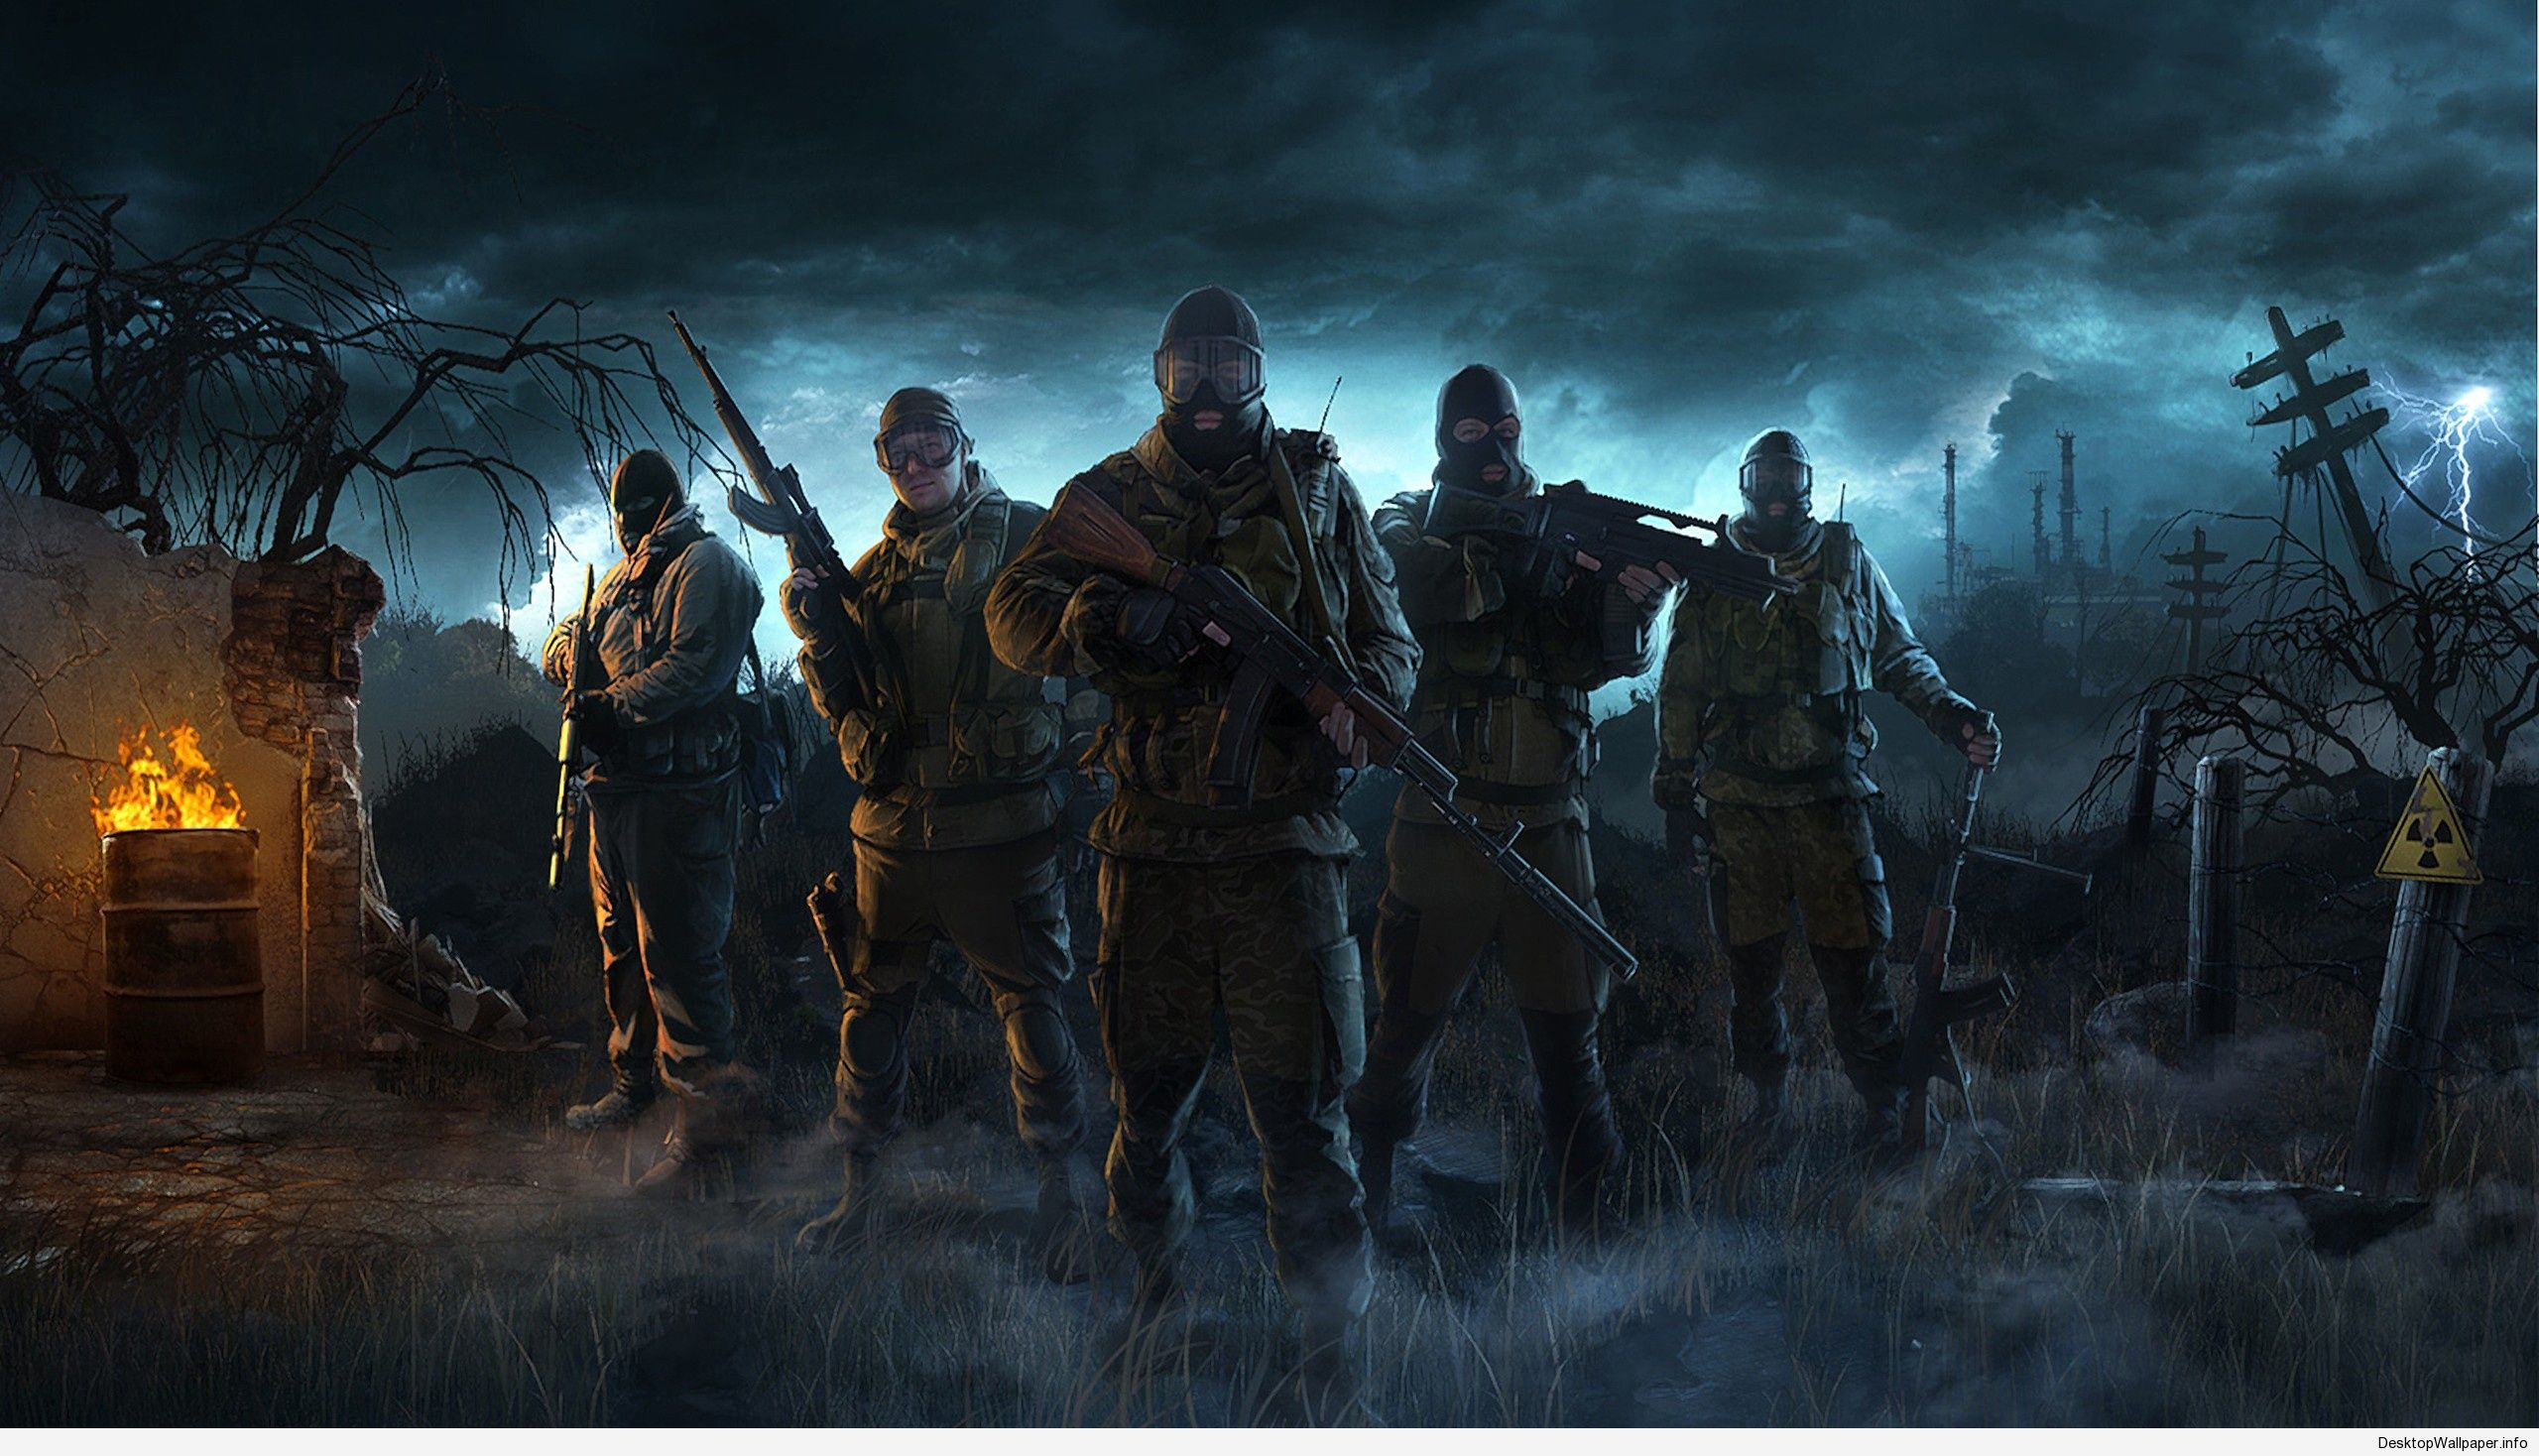 2560x1440 Game Wallpaper